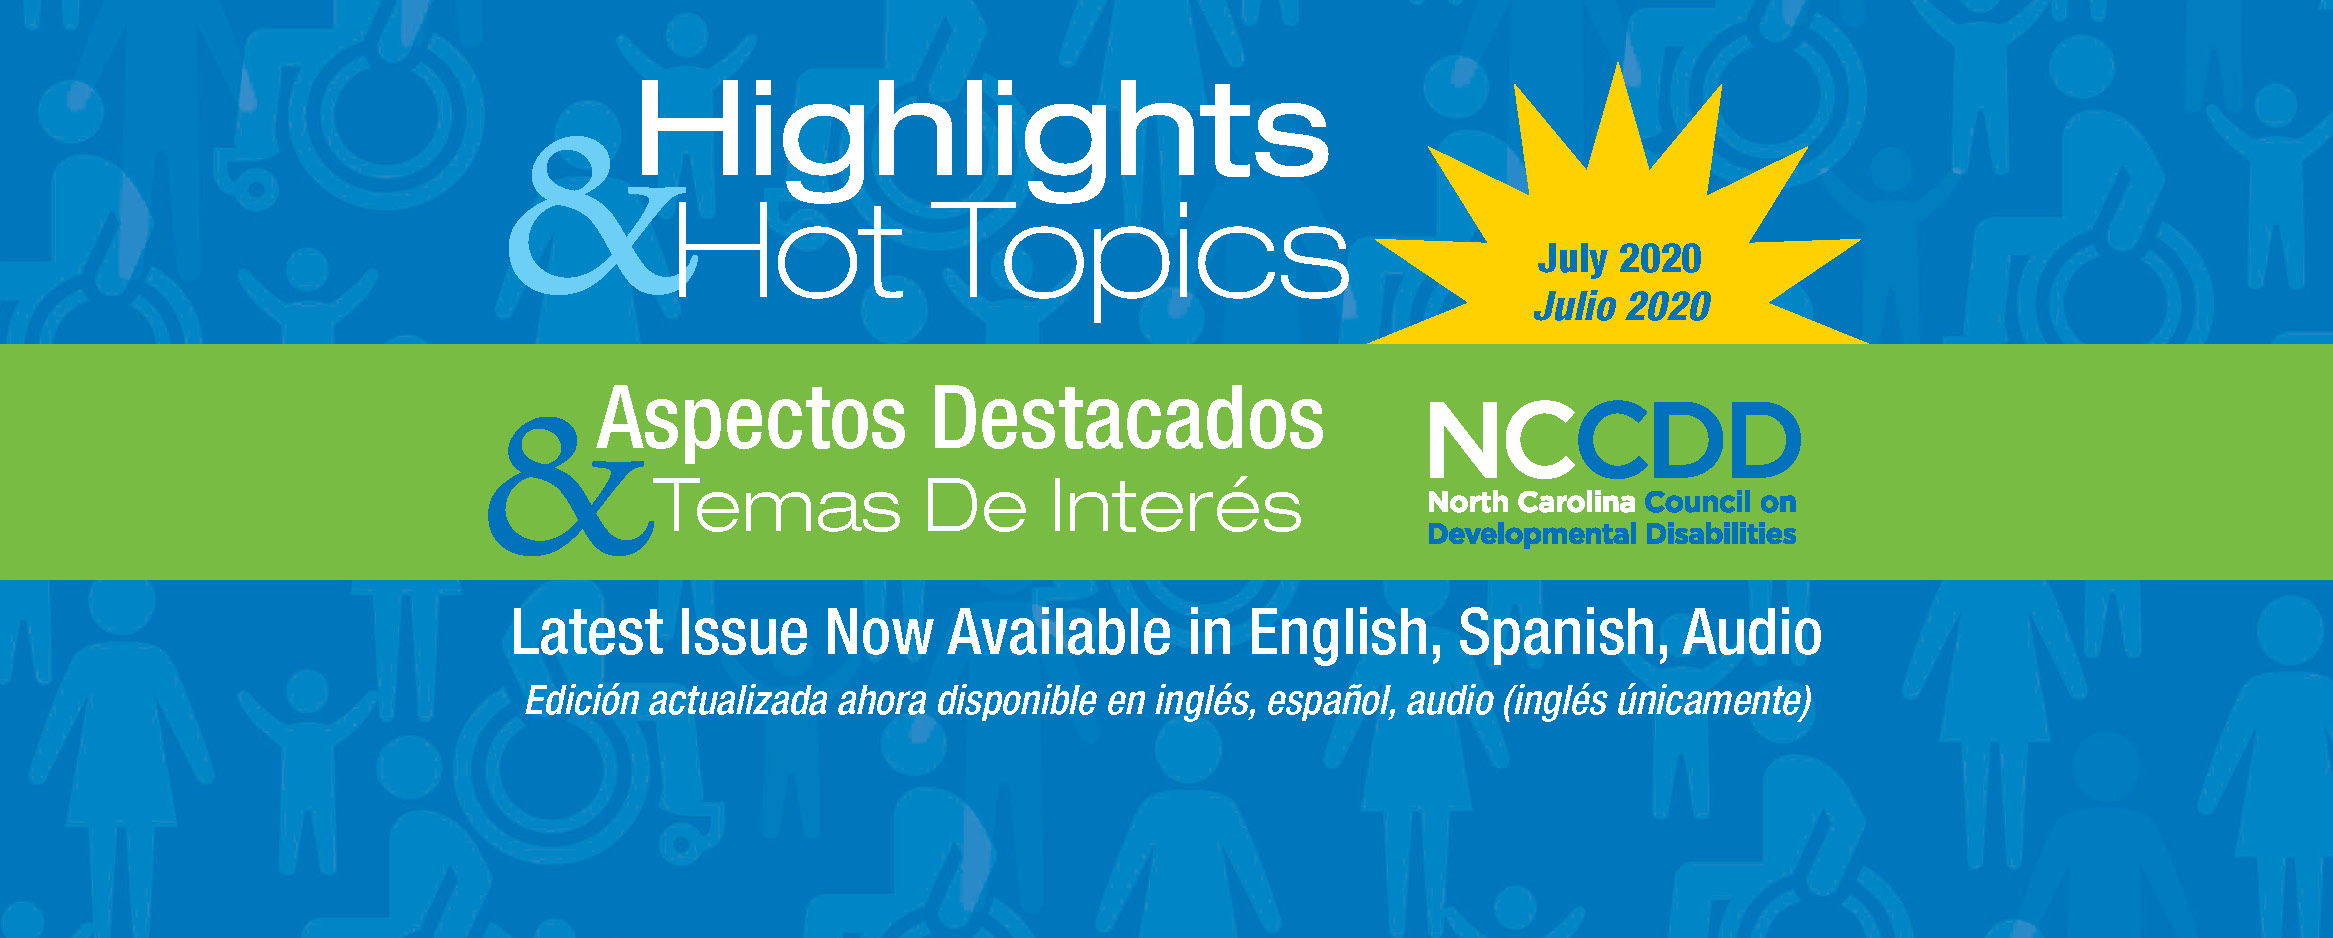 Highlights & Hot Topics! Latest Issue Now Available in English, Spanish, Audio, Edición actualizada ahora disponible en inglés, español, audio (inglés únicamente)